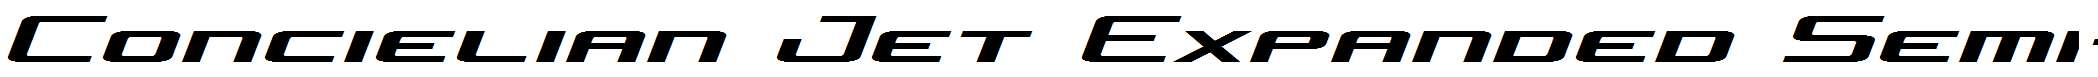 Concielian-Jet-Expanded-Semi-Italic